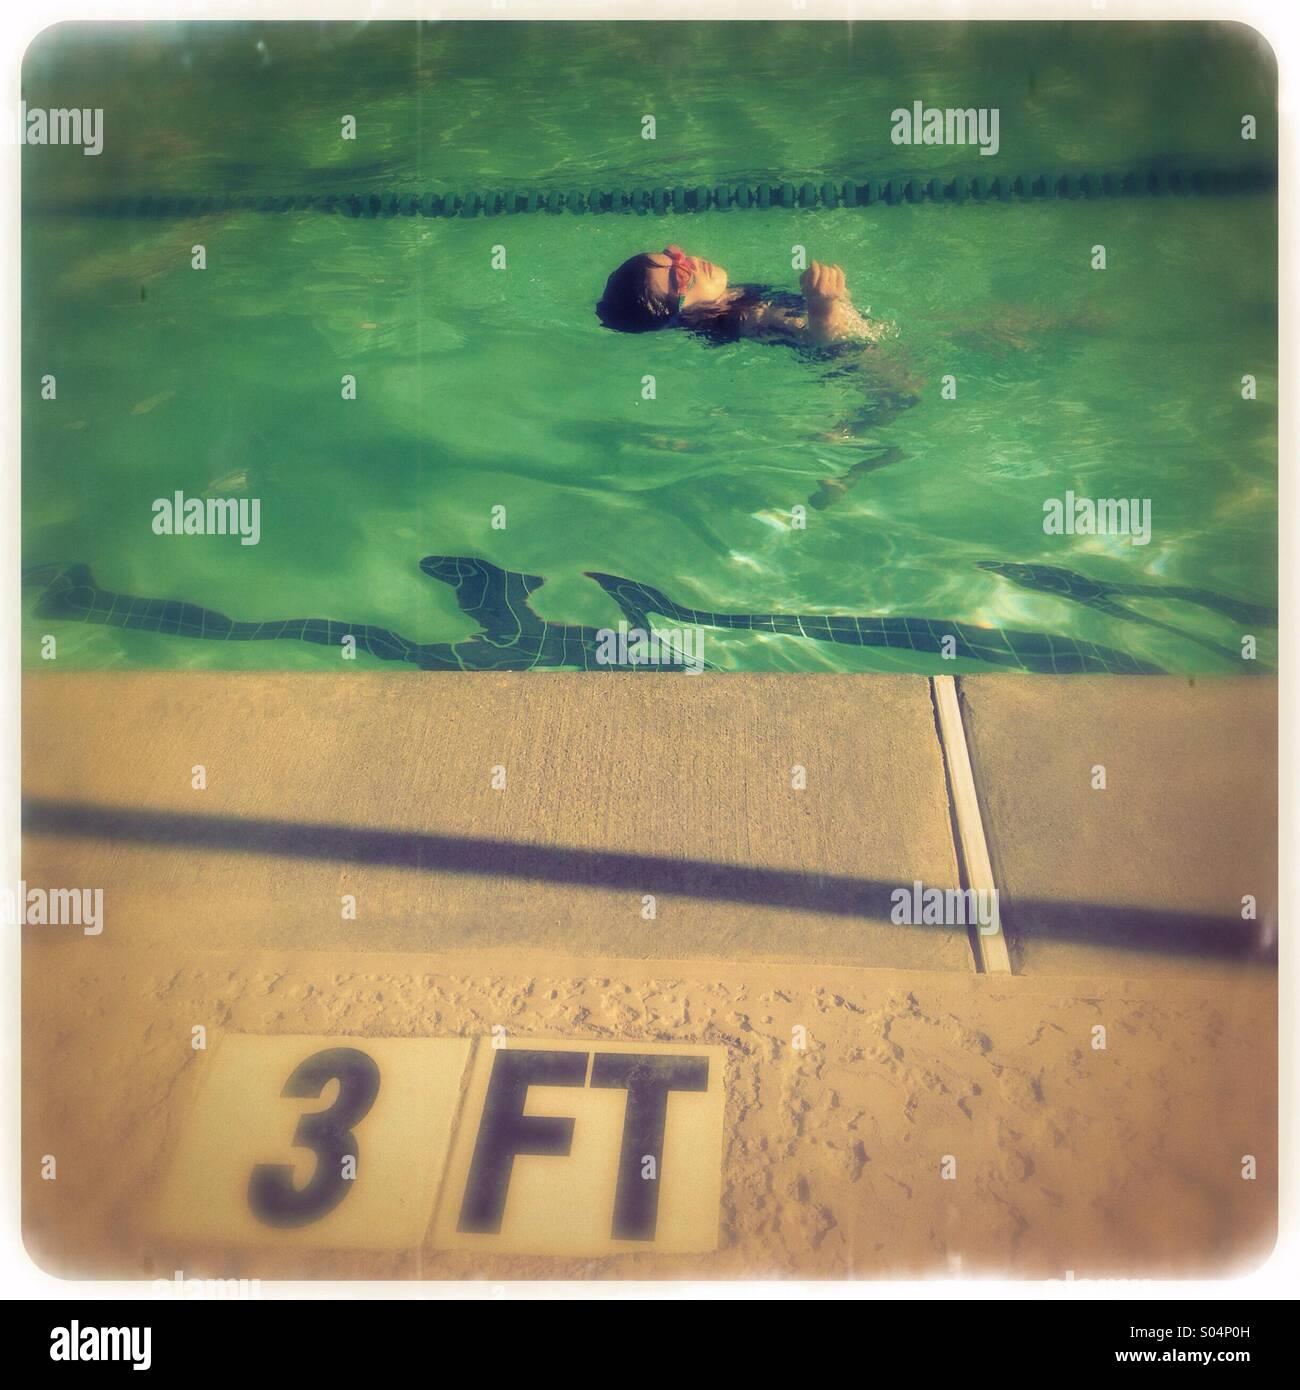 Peu de pratique de la natation Photo Stock